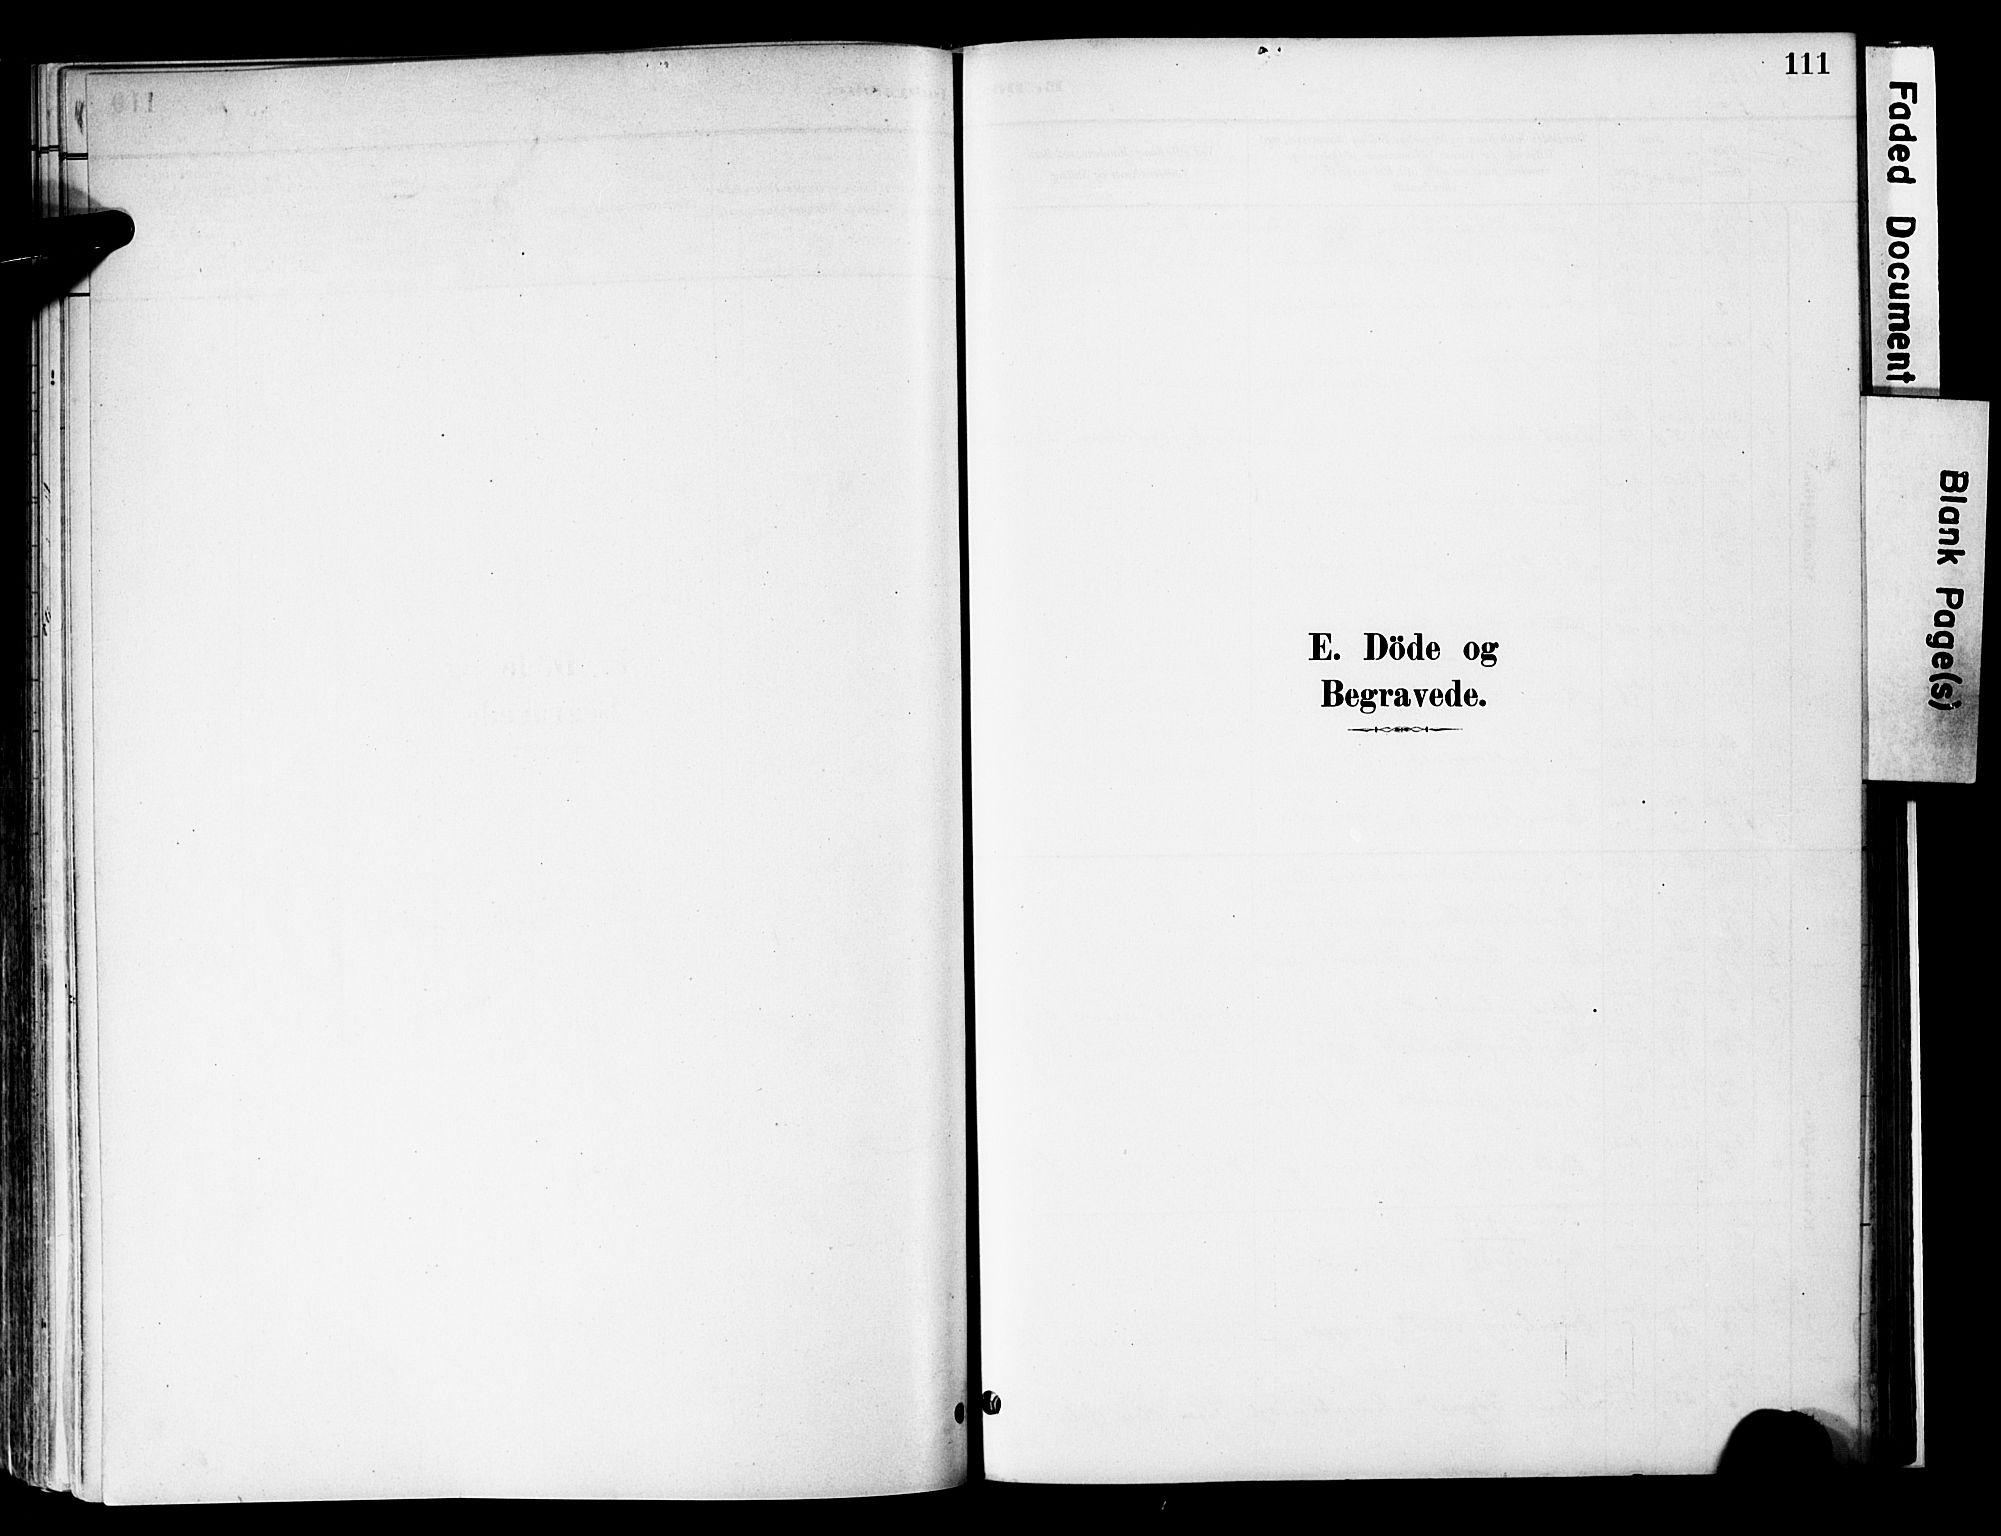 SAH, Vestre Slidre prestekontor, Ministerialbok nr. 6, 1881-1912, s. 111